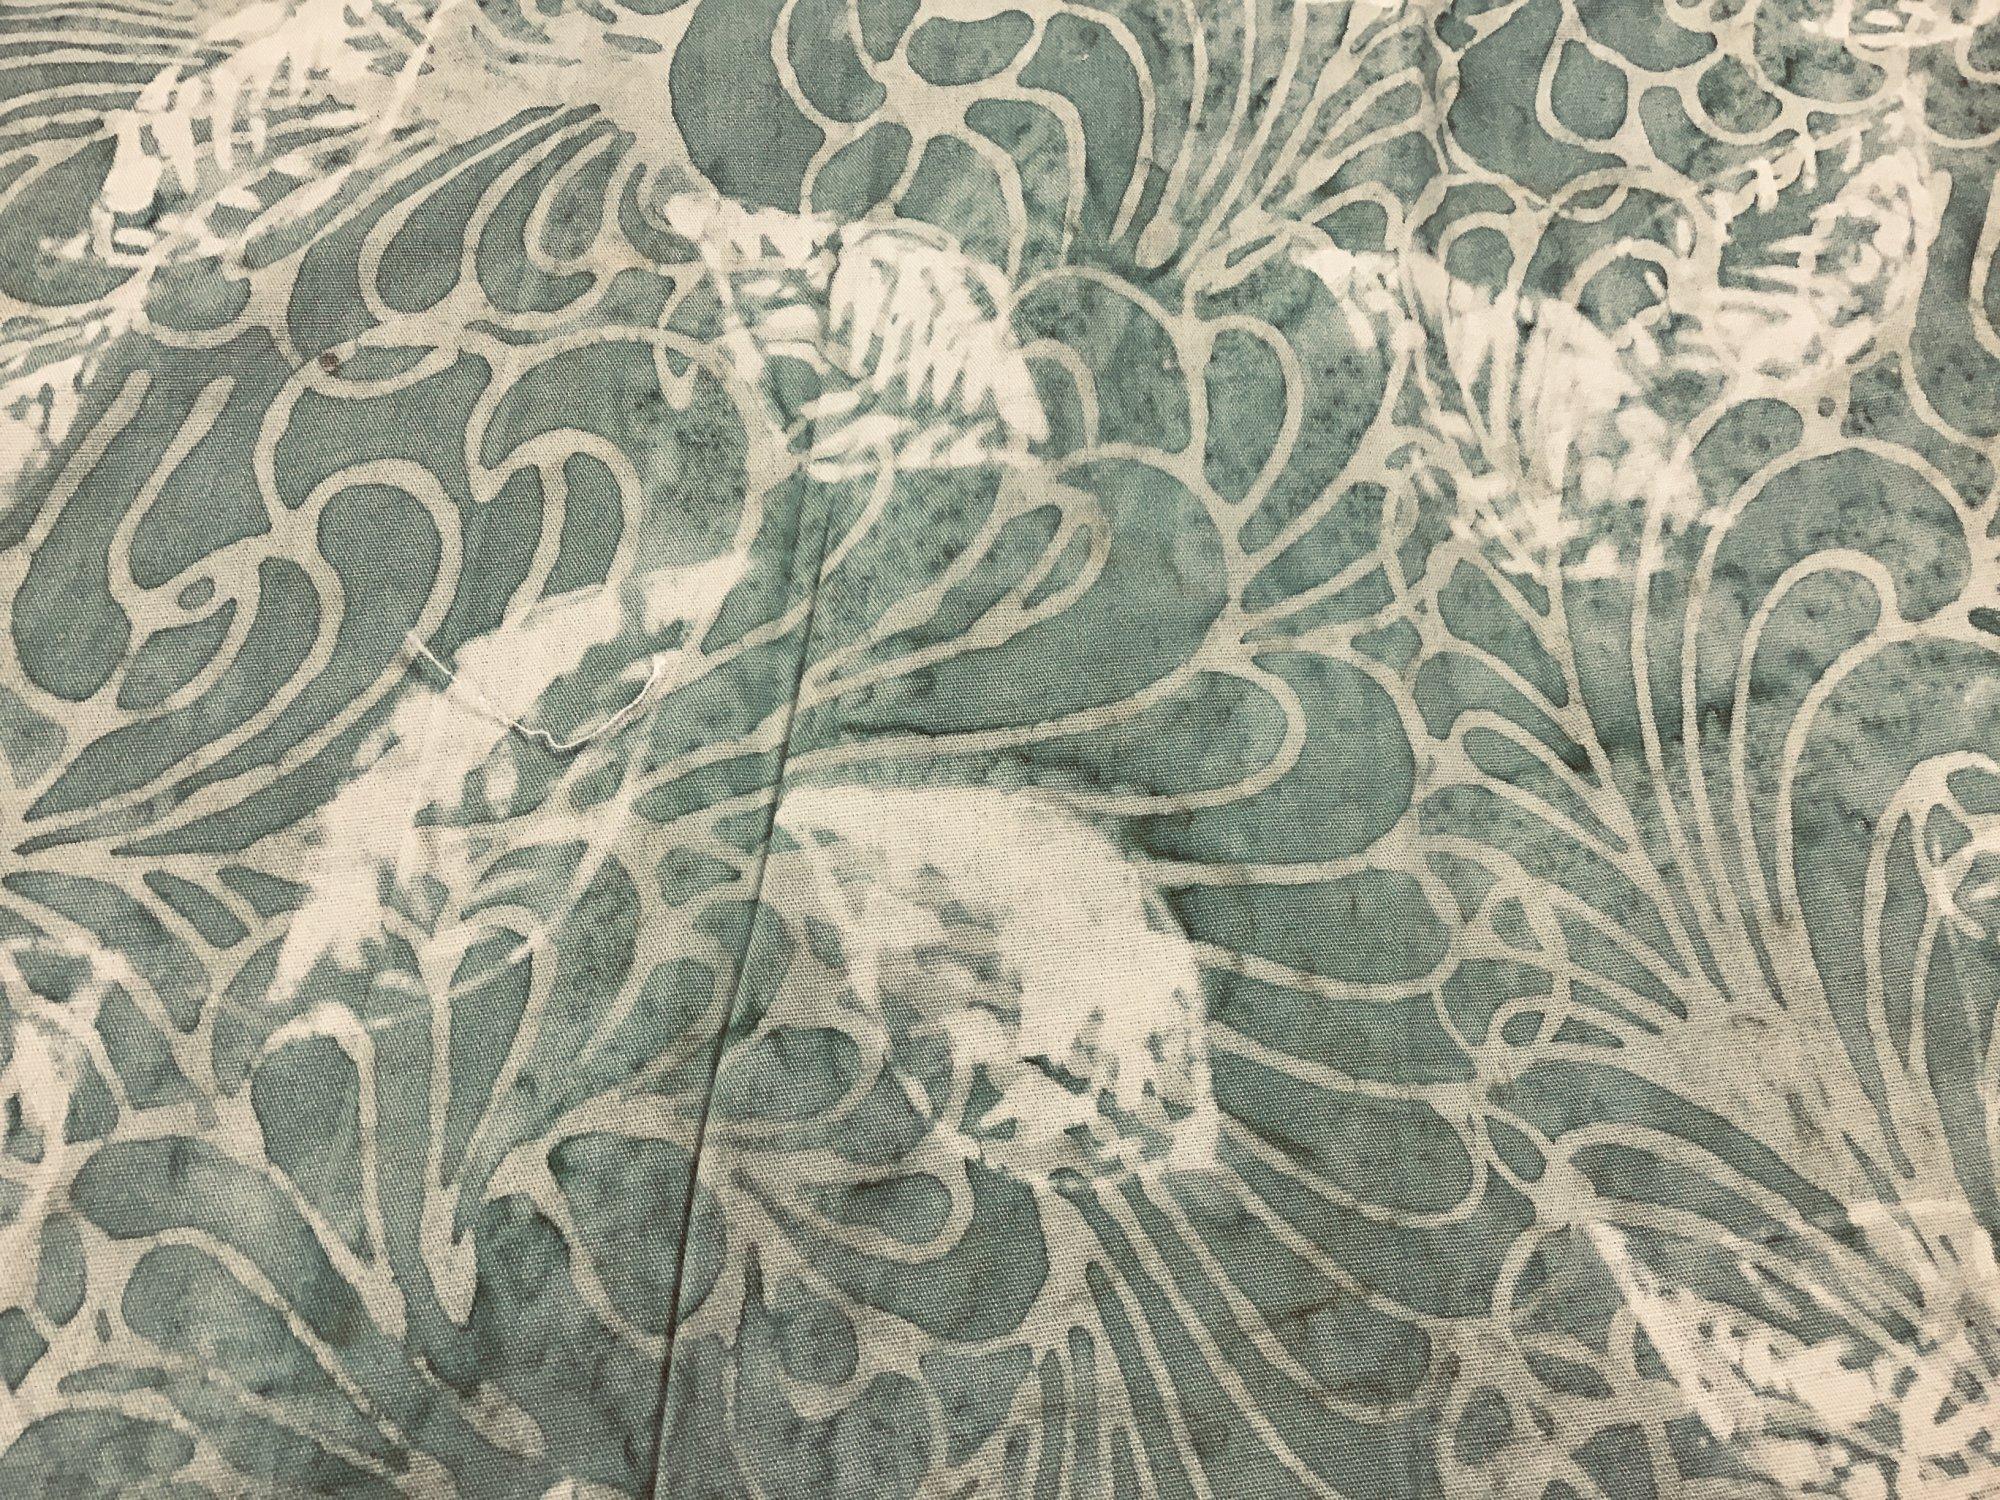 Batik - Boreal - Spring Green 1 - 1pc - 0.89m/35in